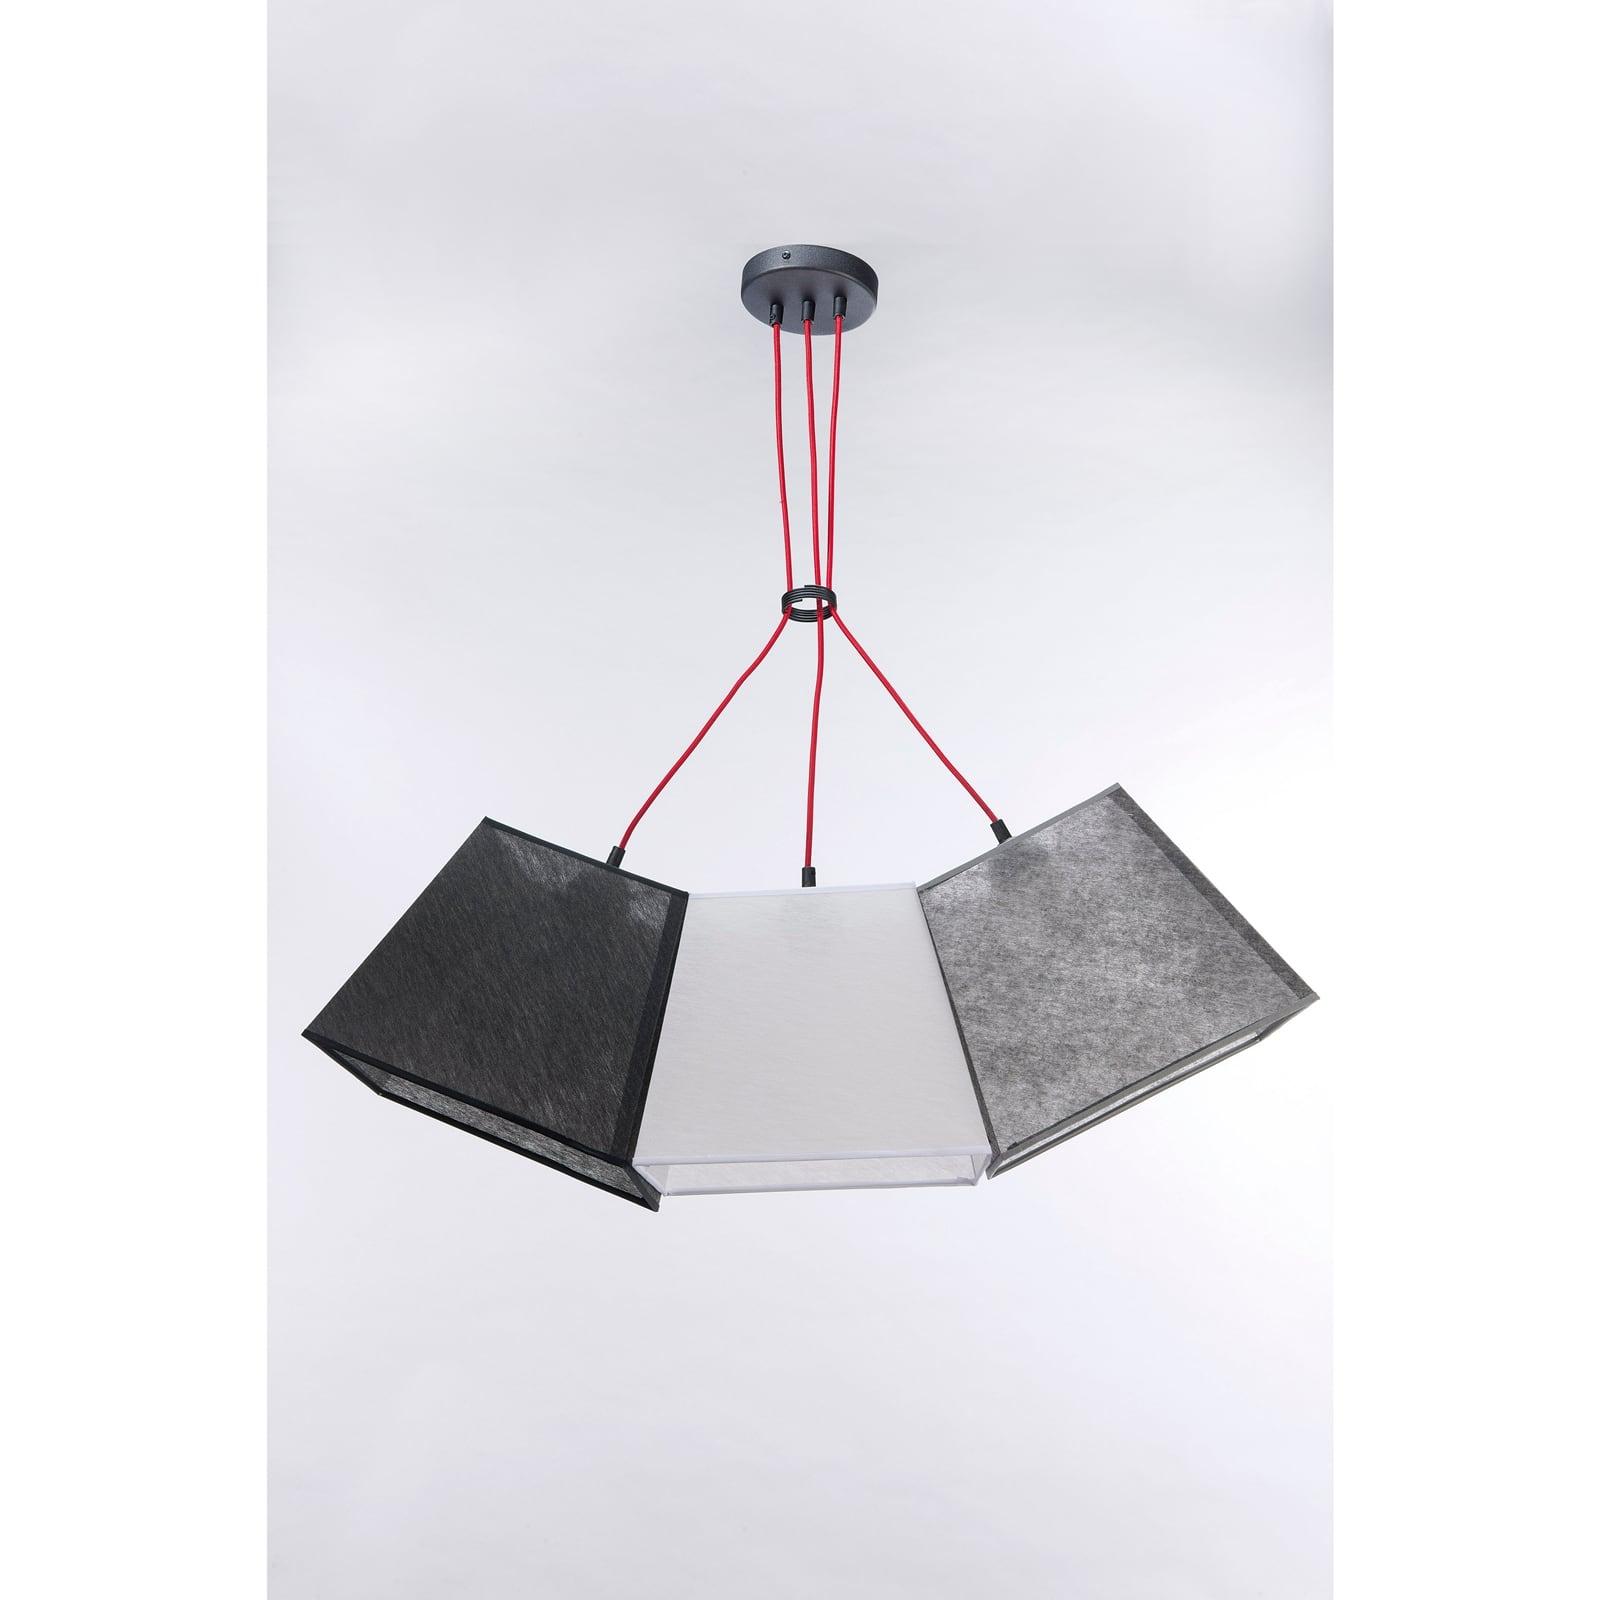 Lampa suspendată WERDER 3 Nr. 3227